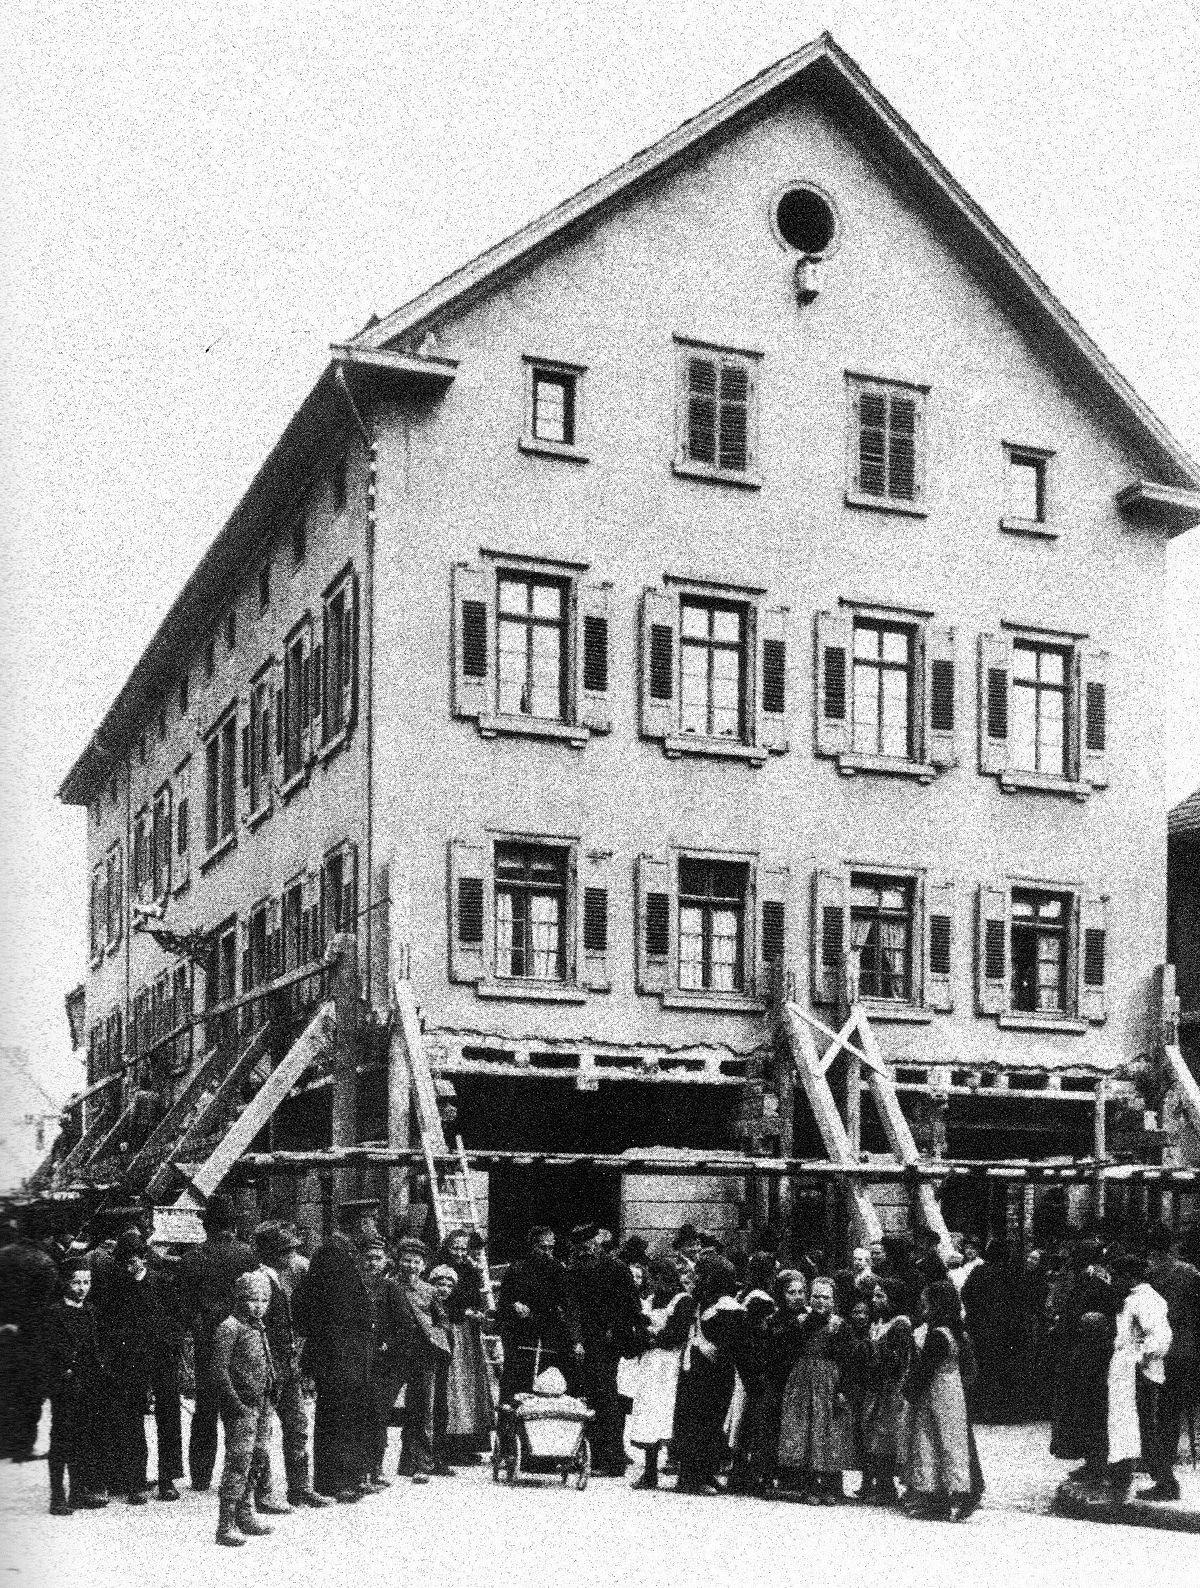 Hirsch Katastrophe Wikipedia